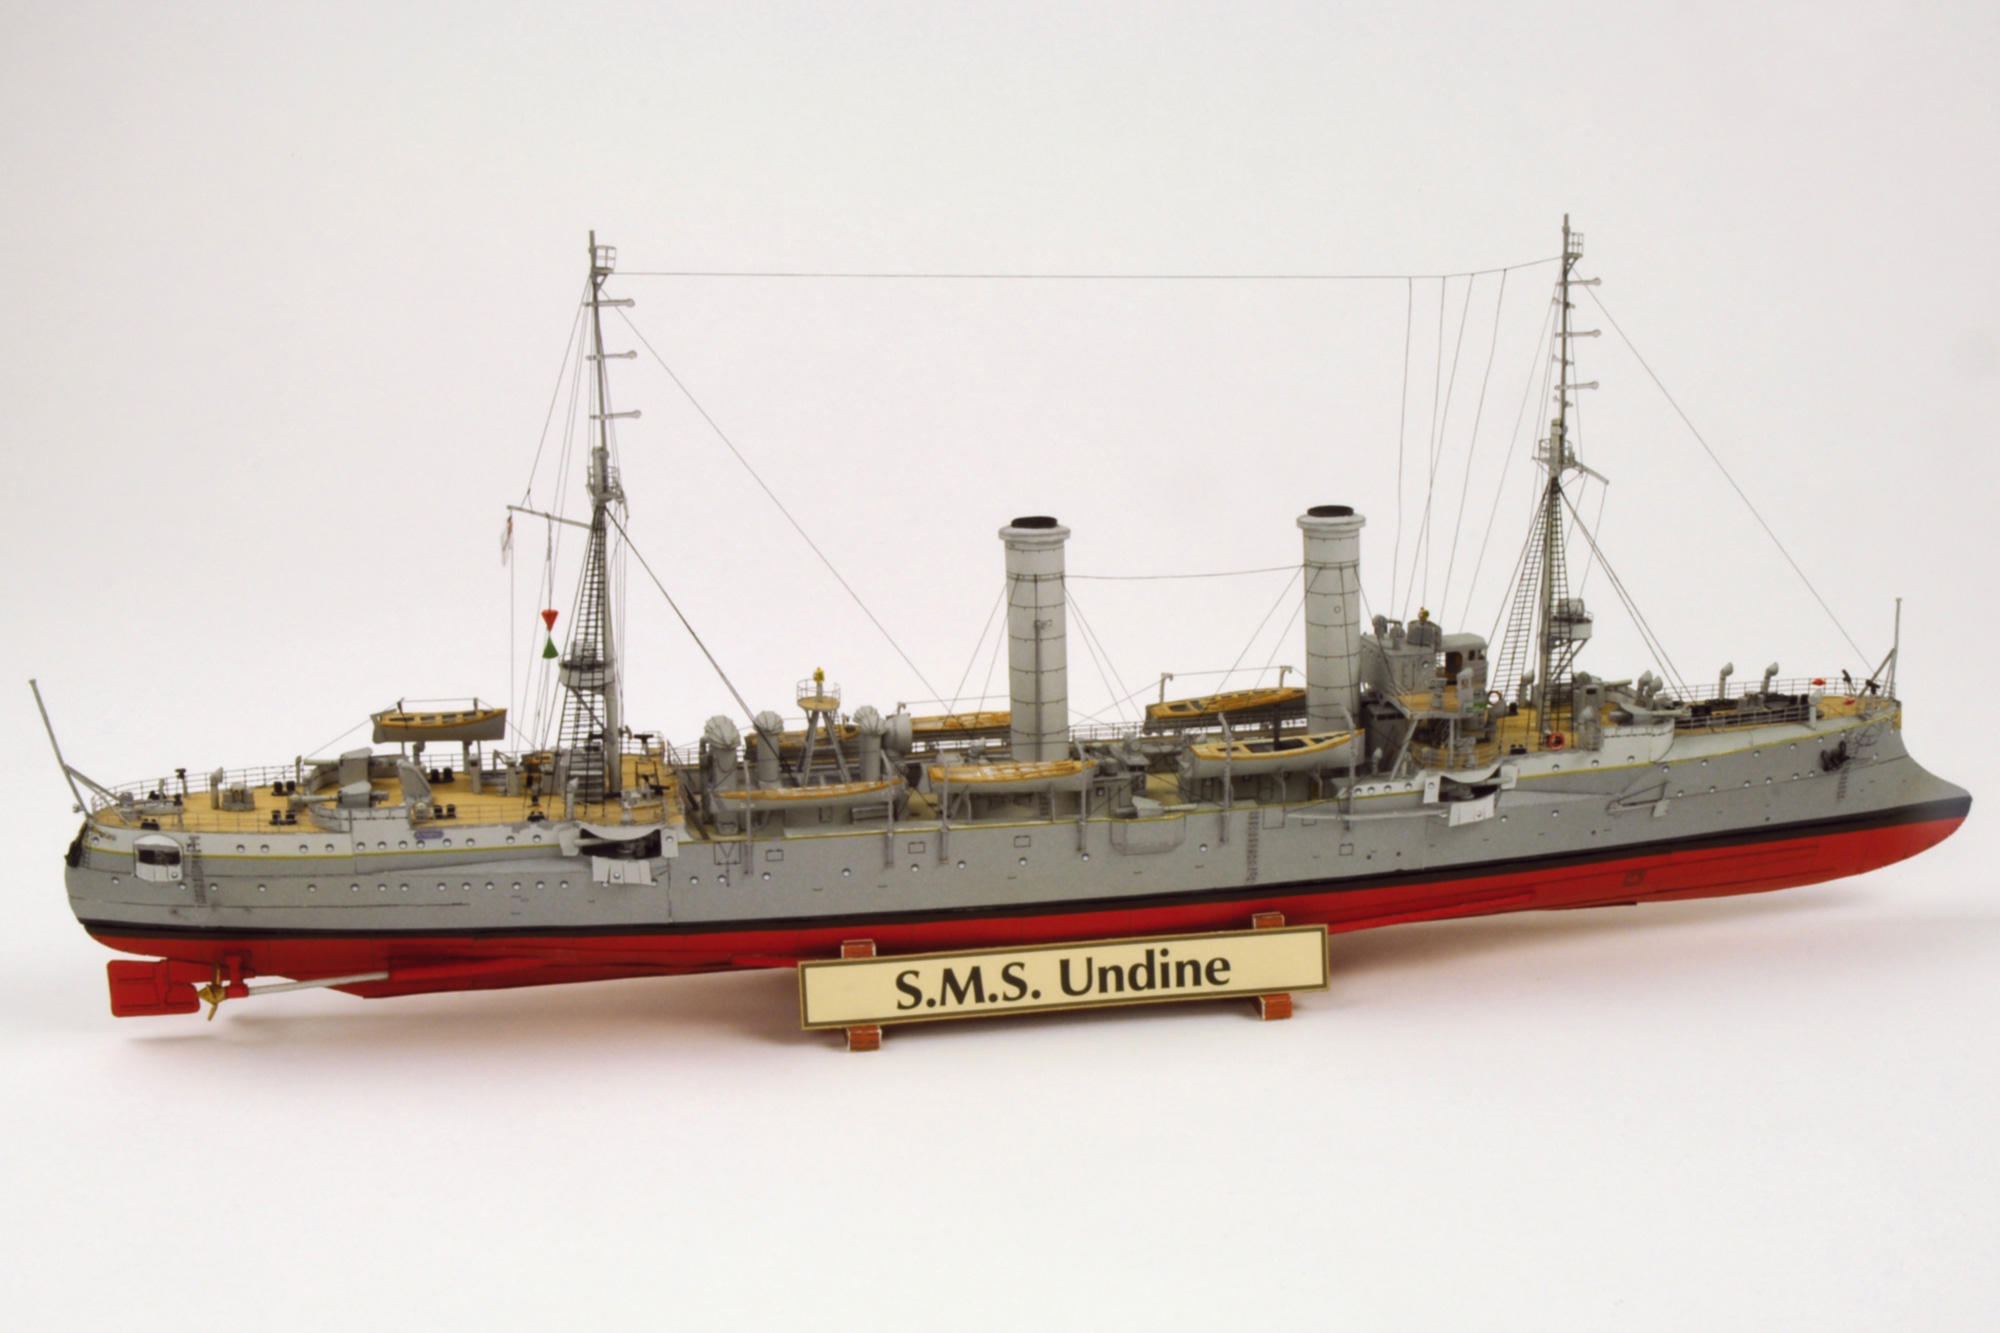 Hamburger Modellbaubogen ... Kartonmodell Kleiner Kreuzer SMS Undine 1:250 HMV